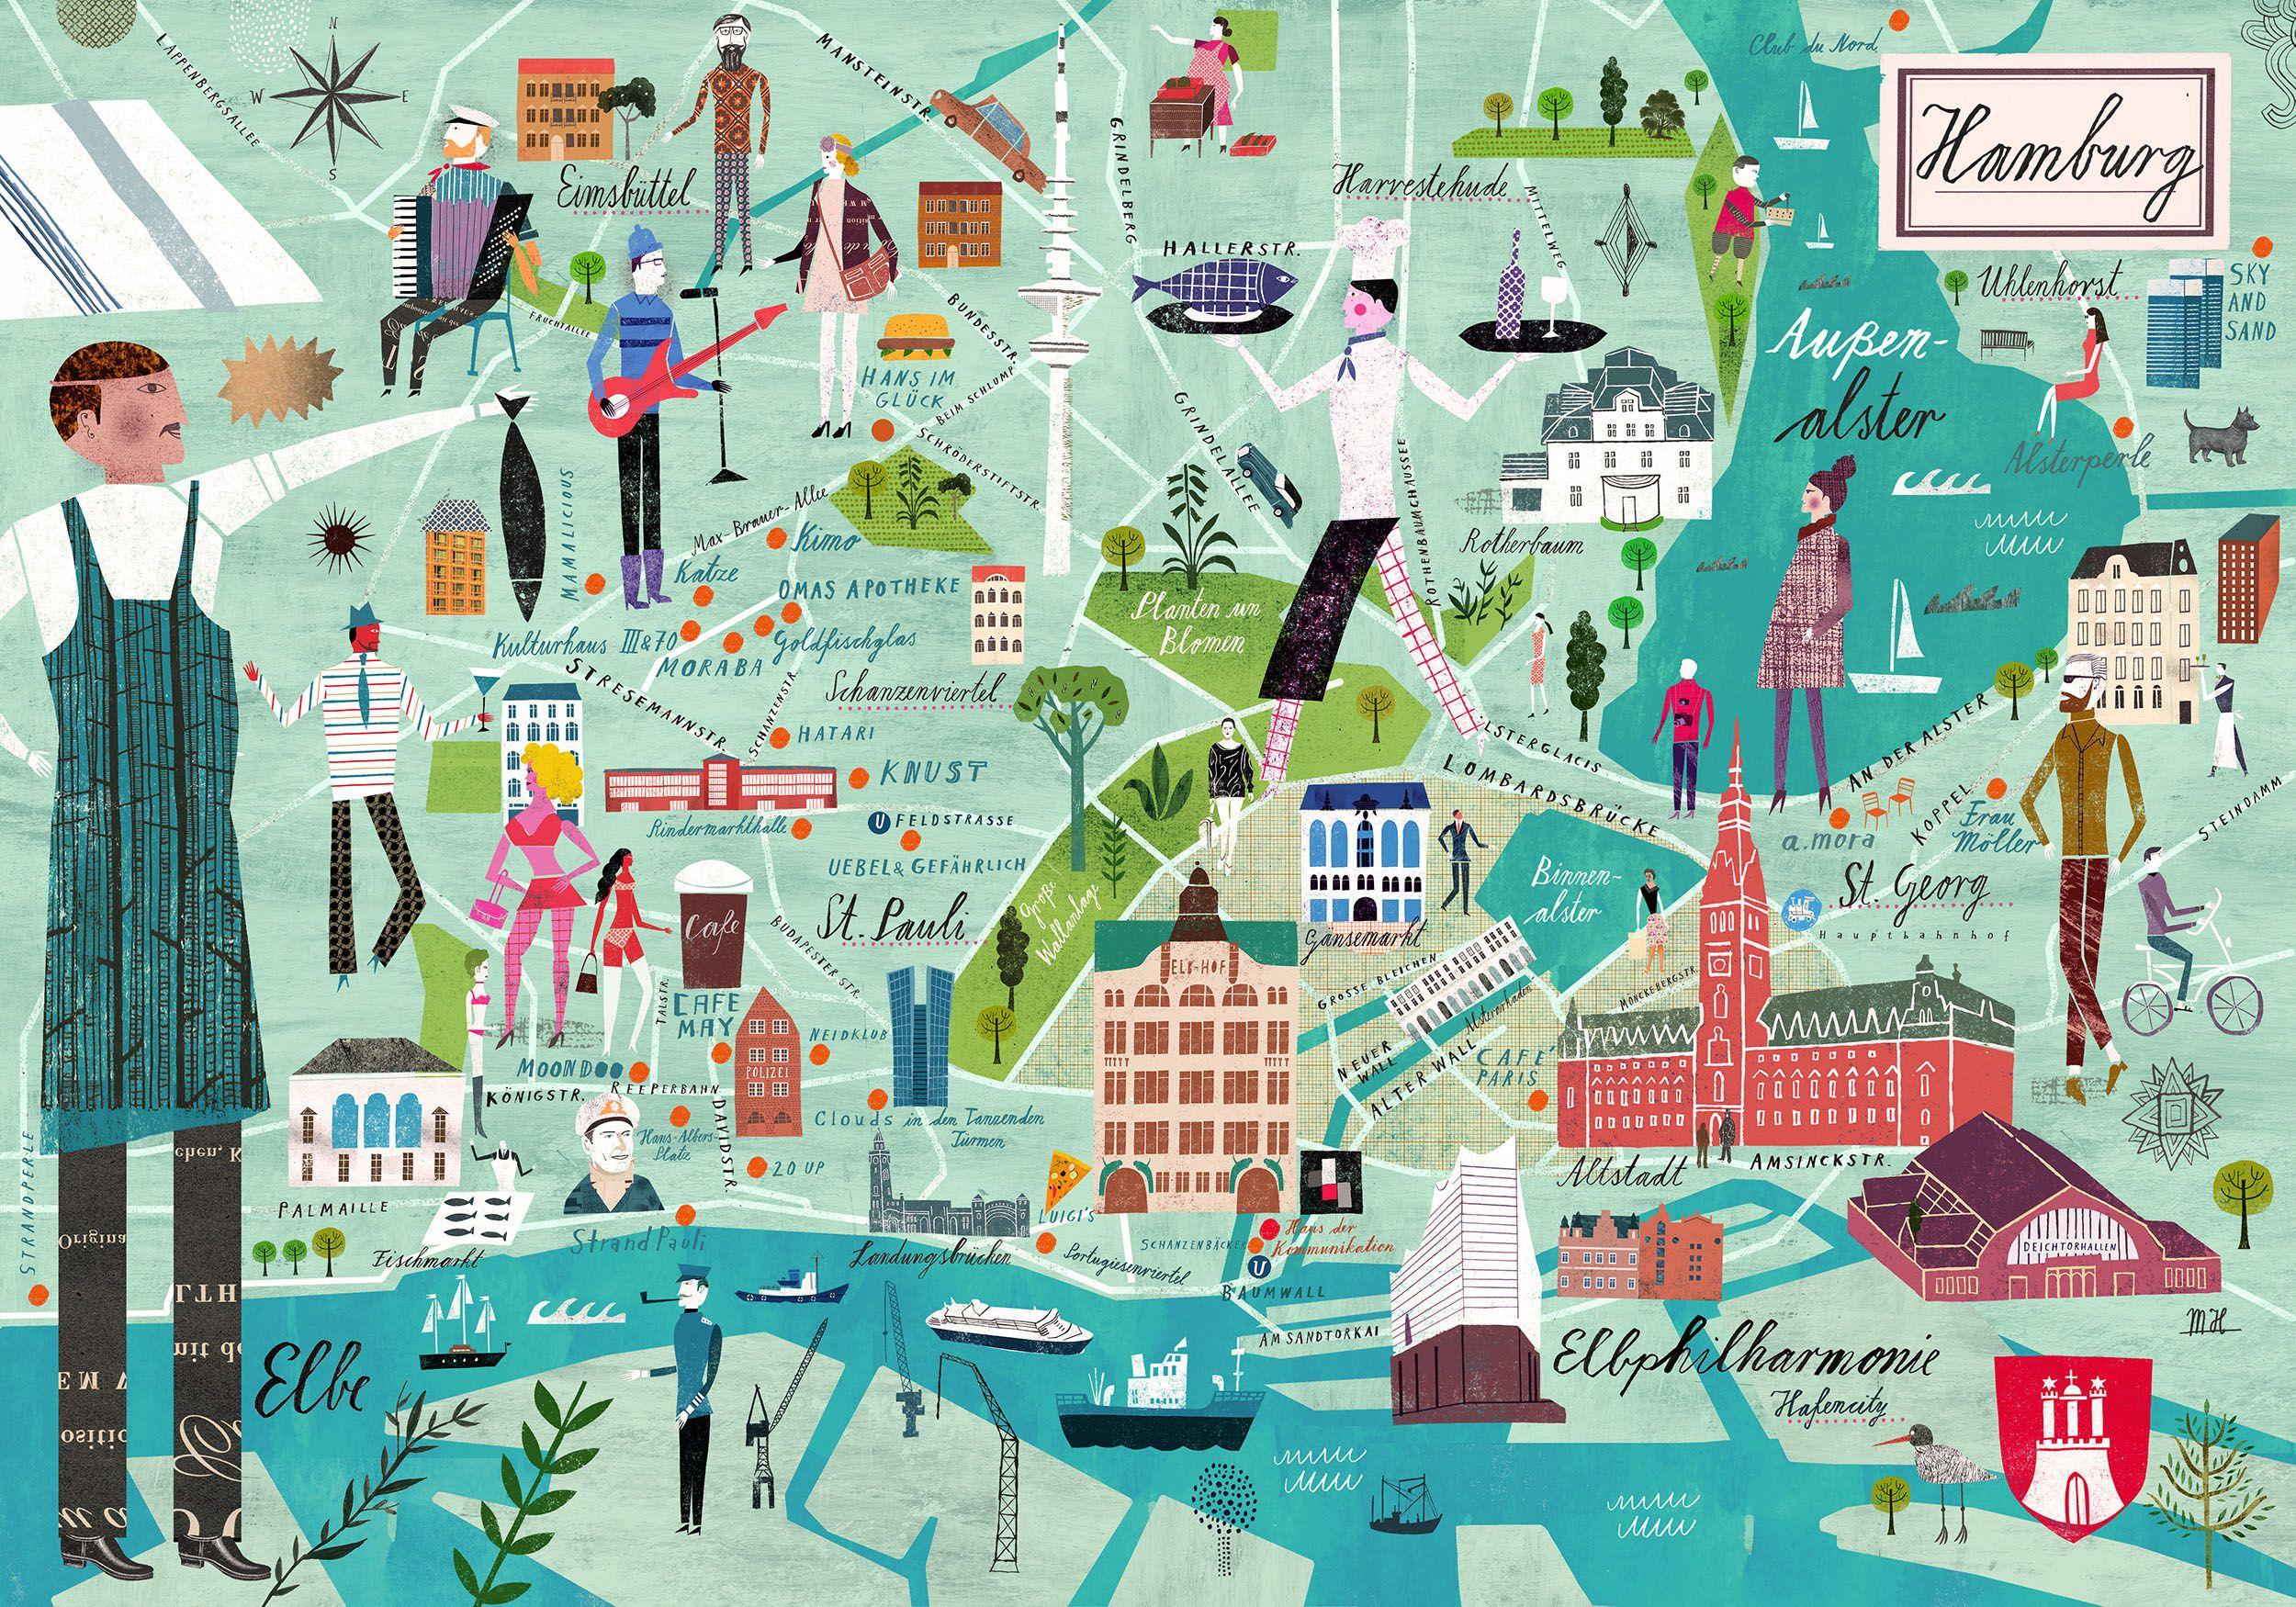 Hamburg Map For Serviceplan Hamburg Tipps